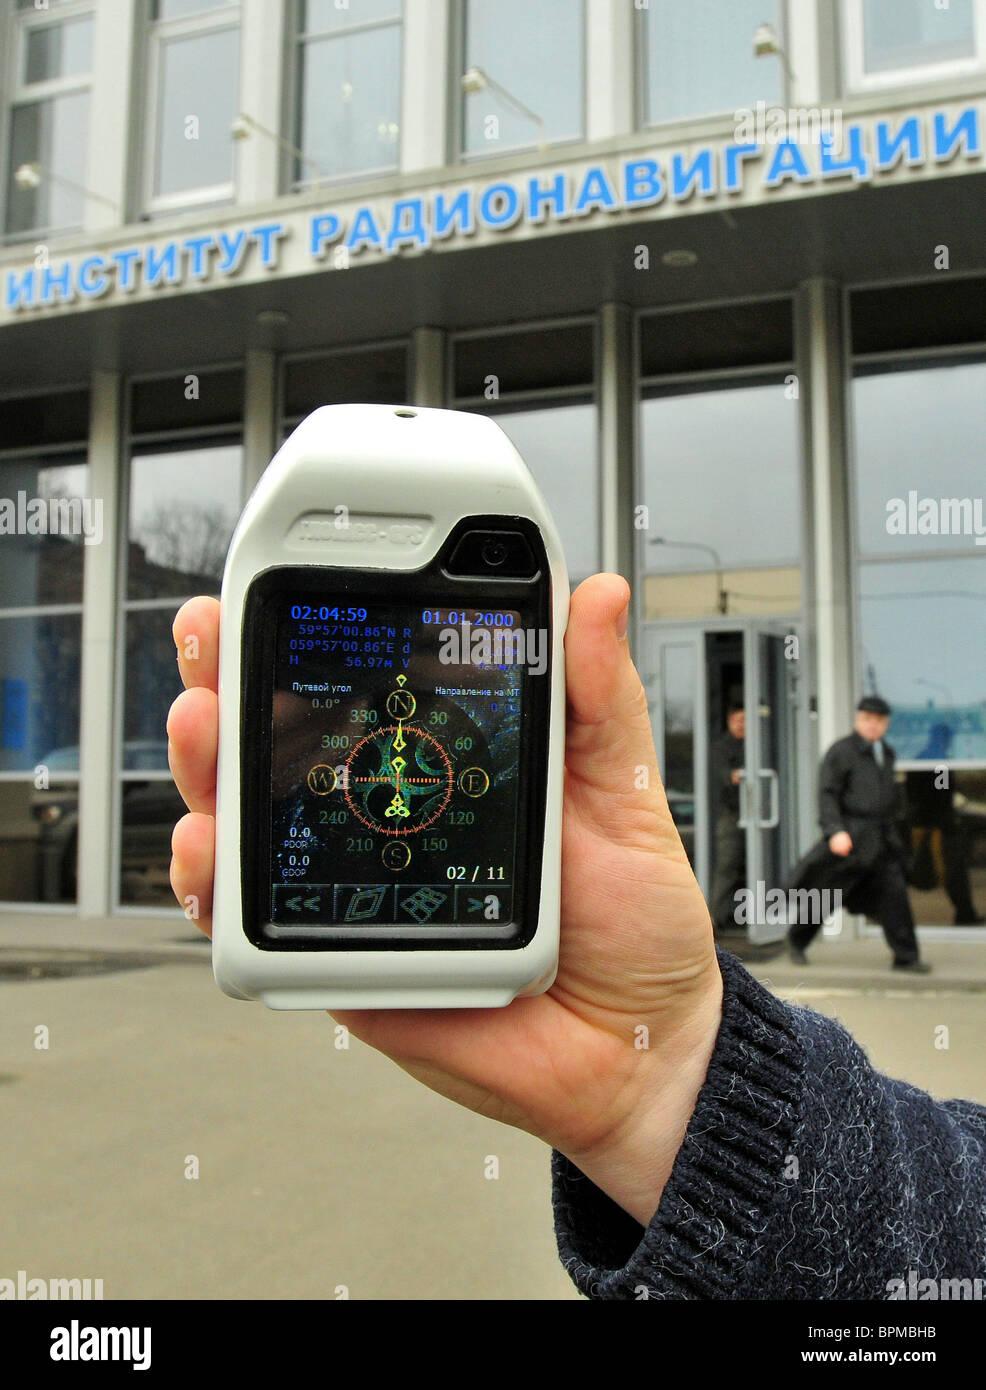 Russia October 27 Glonass Gps Satellite Synchronizing Navigator